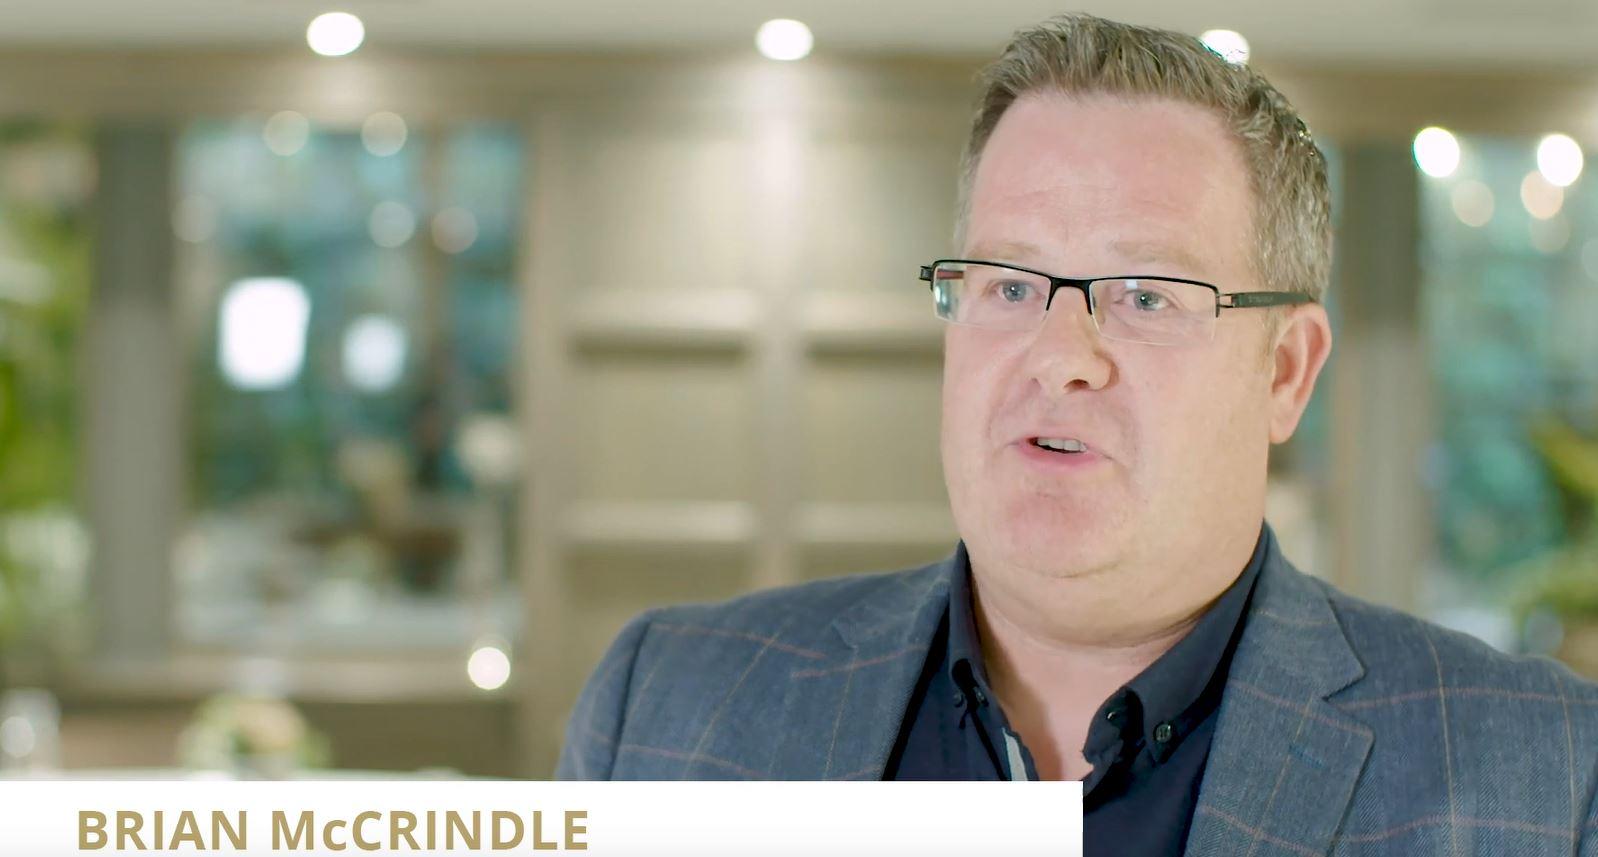 Brian McCrindle as Board Trustee